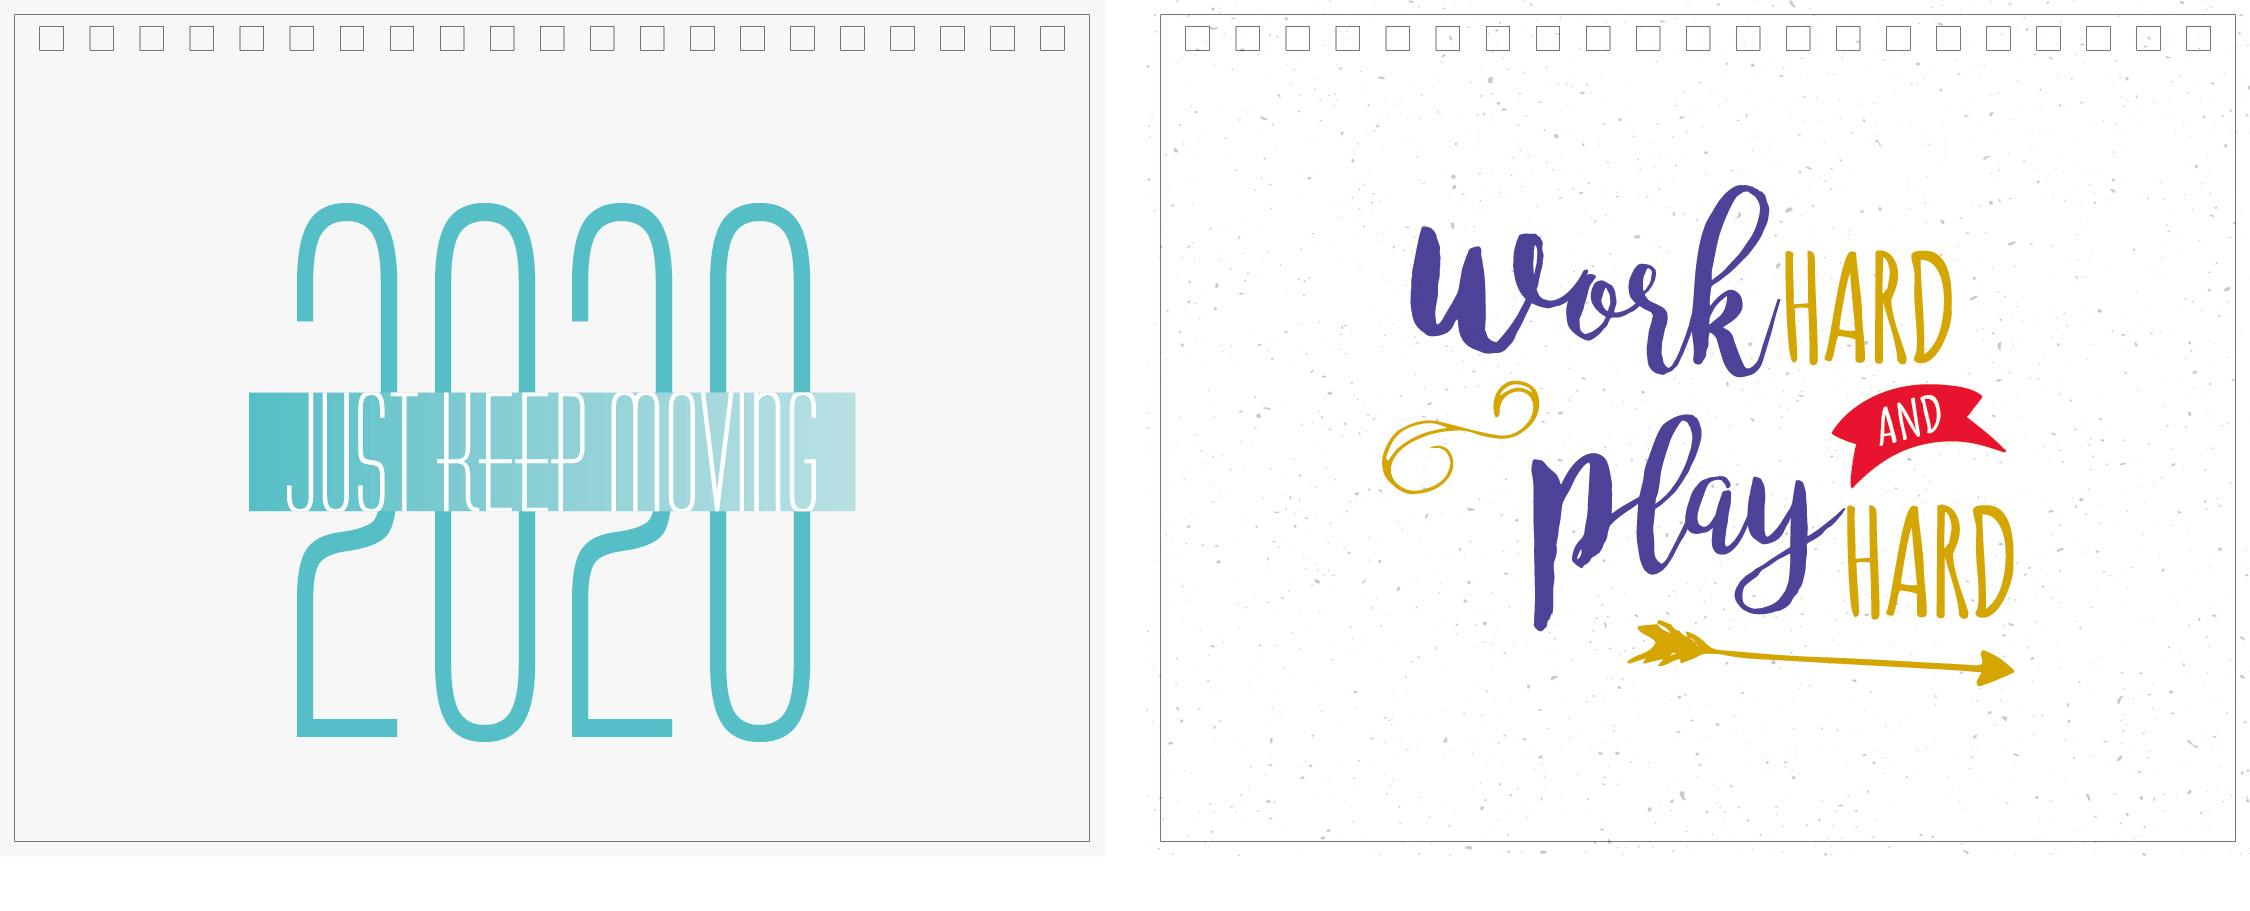 Print100 Desk CalendarB022